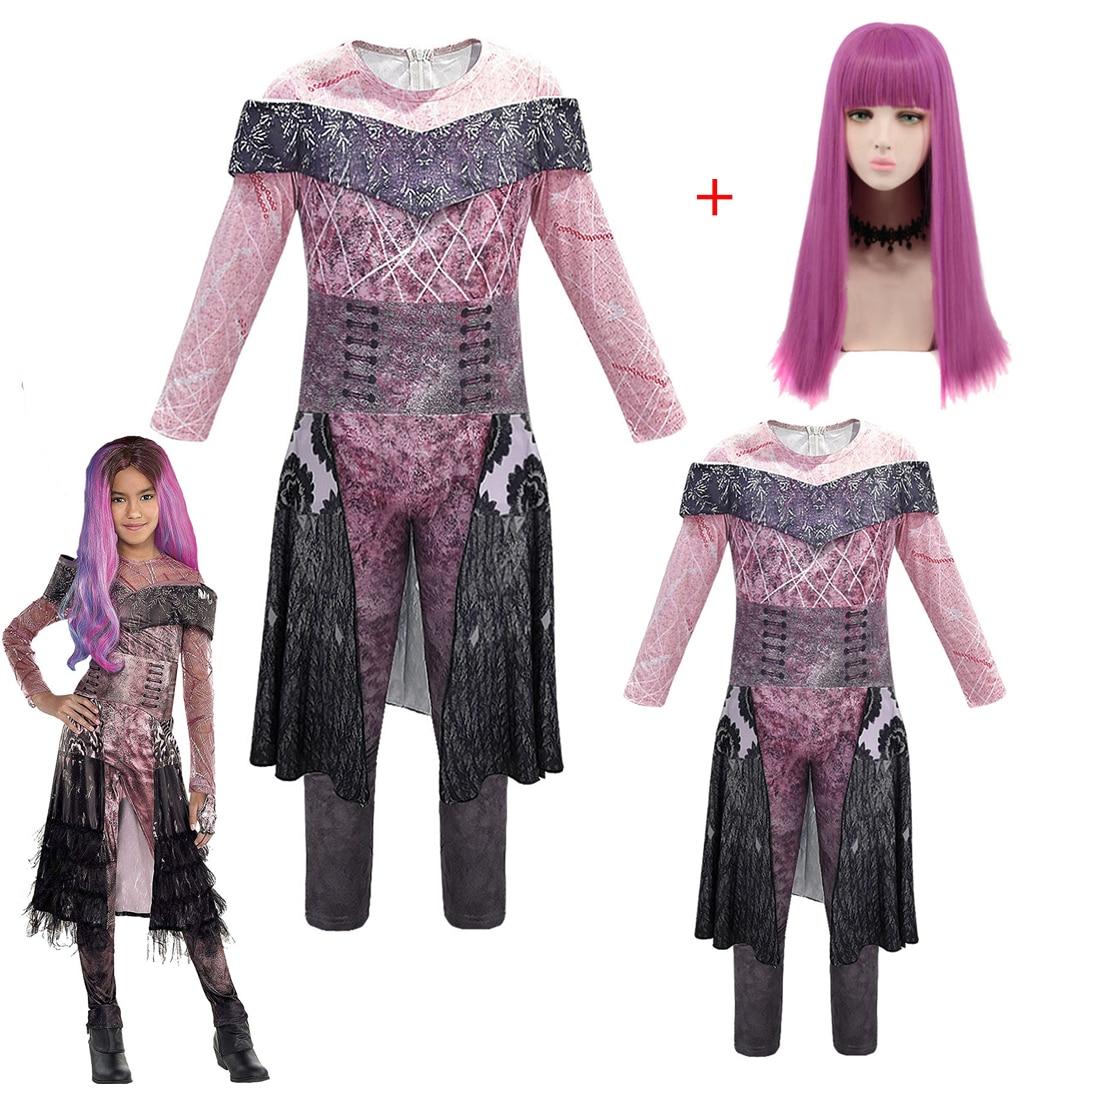 Disfraz de Halloween para niños mujeres descendentes 3 Mal Berta maléfica Audrey Cosplay disfraz carnaval ropa monos para niña